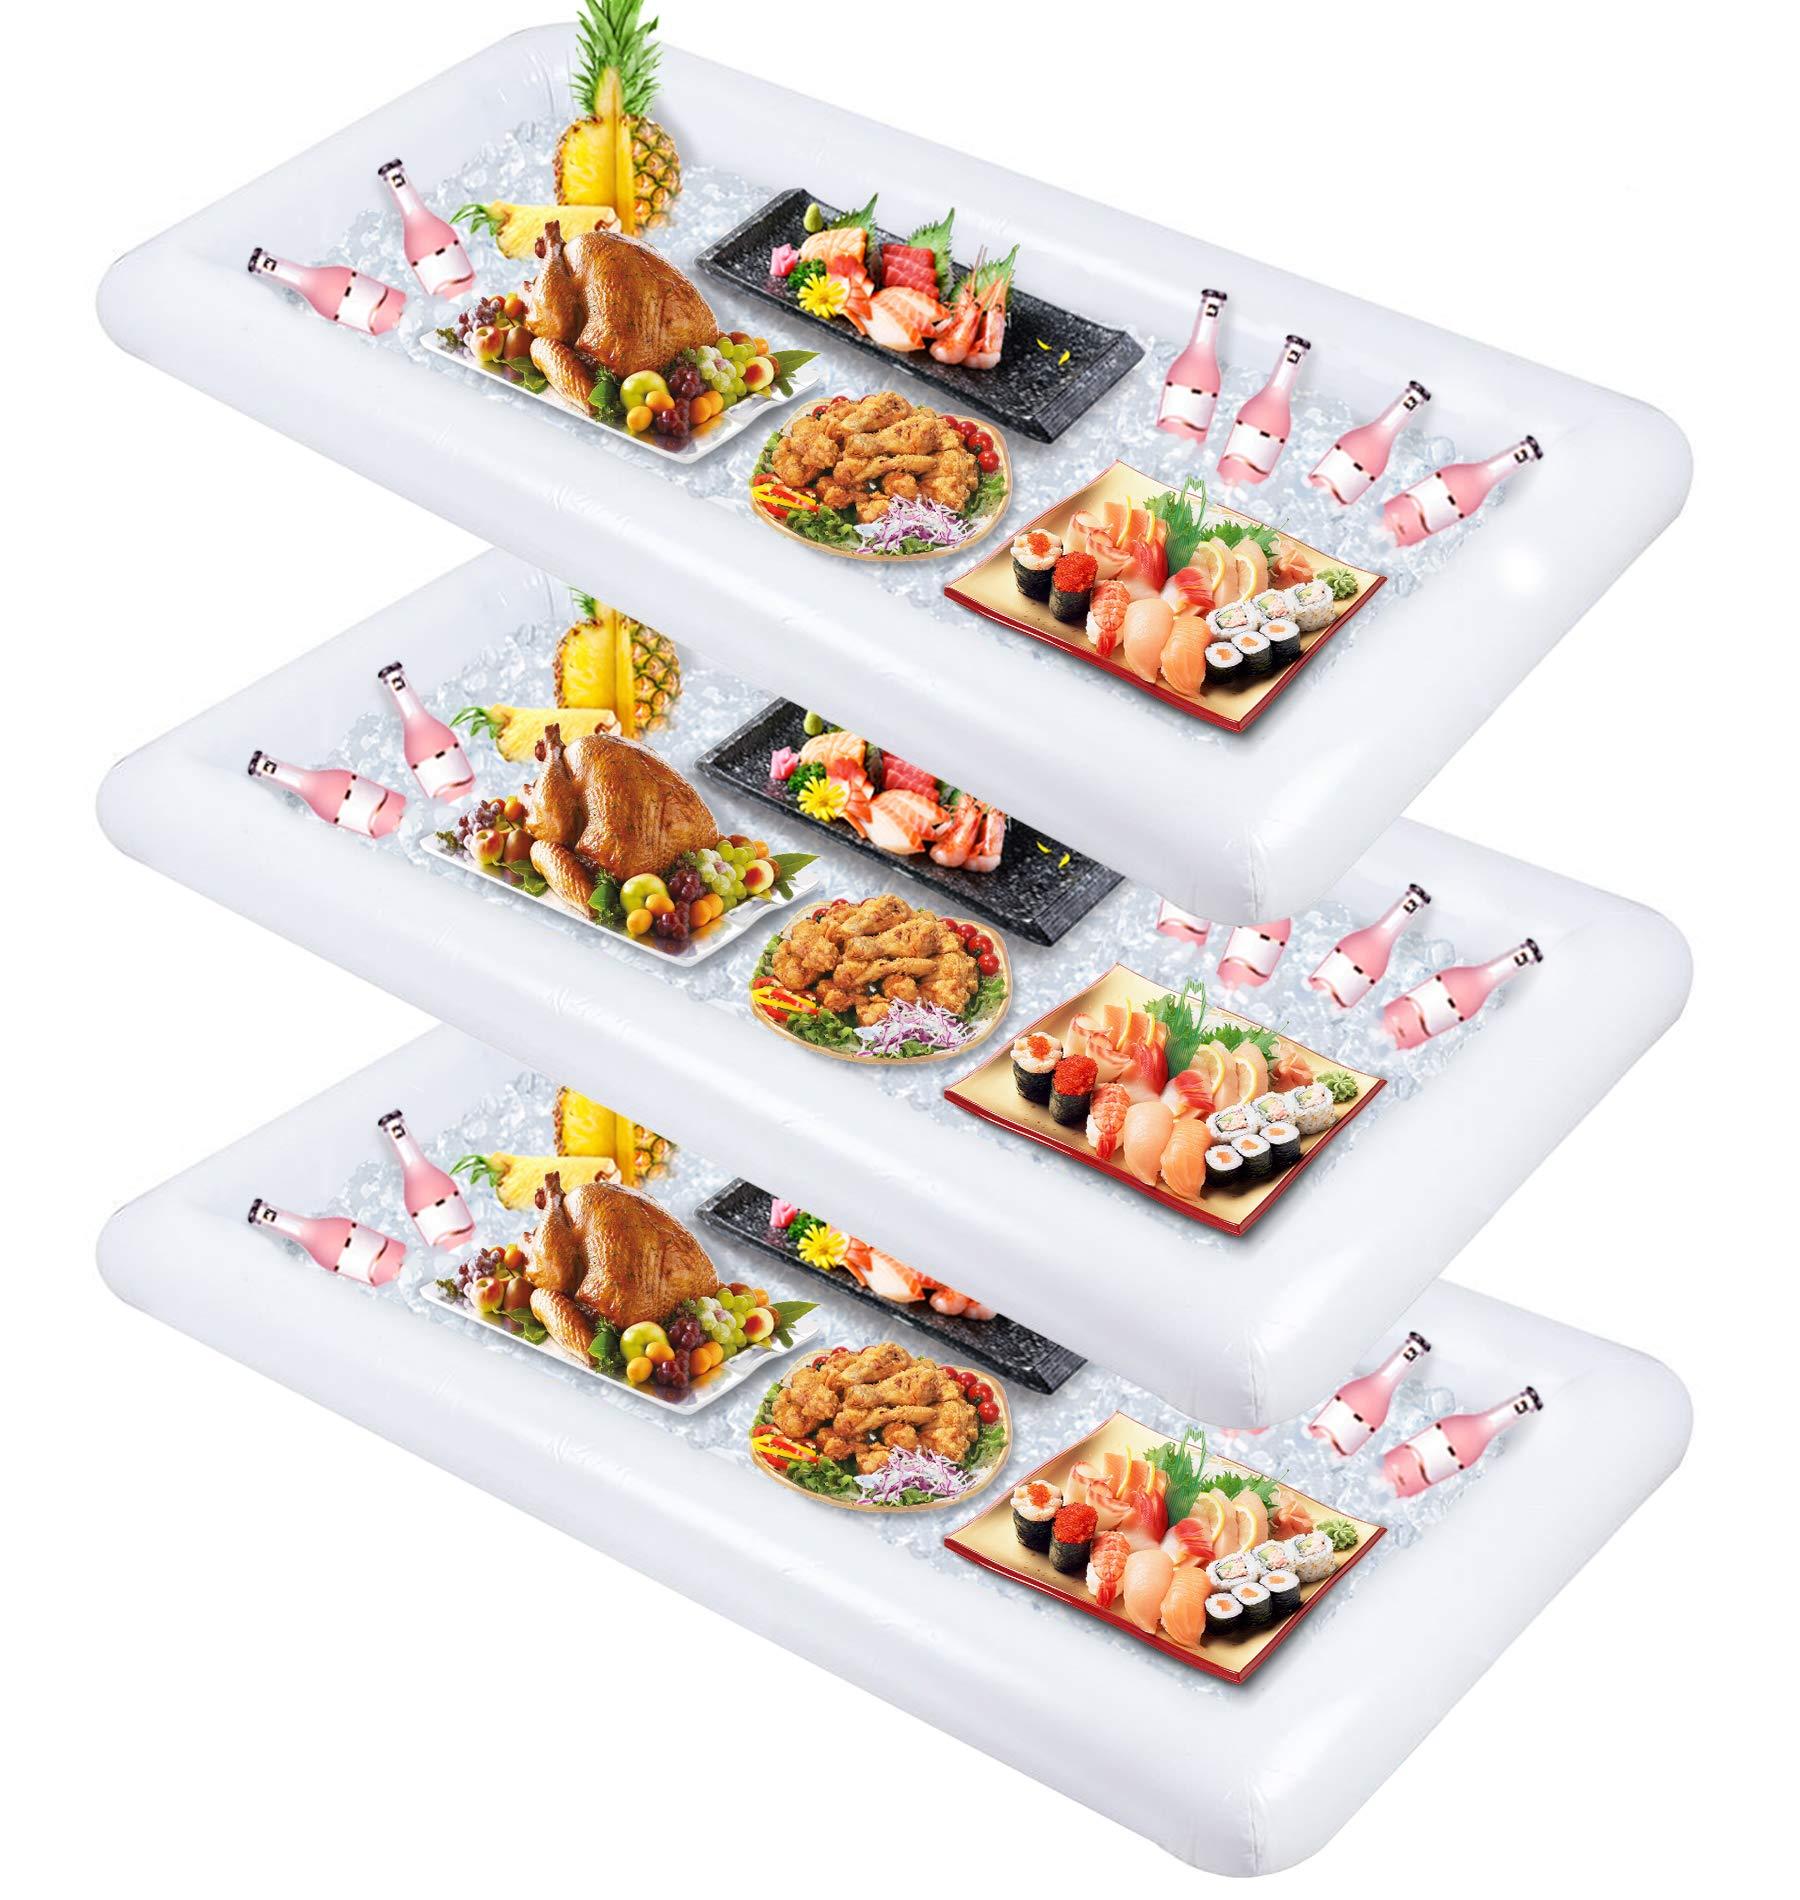 Inflatable Serving Bar,Buffet Cooler with drain plug - Salad Picnic Ice Food Server - Luau Pool Hawaiian Party Supplies 3PCS